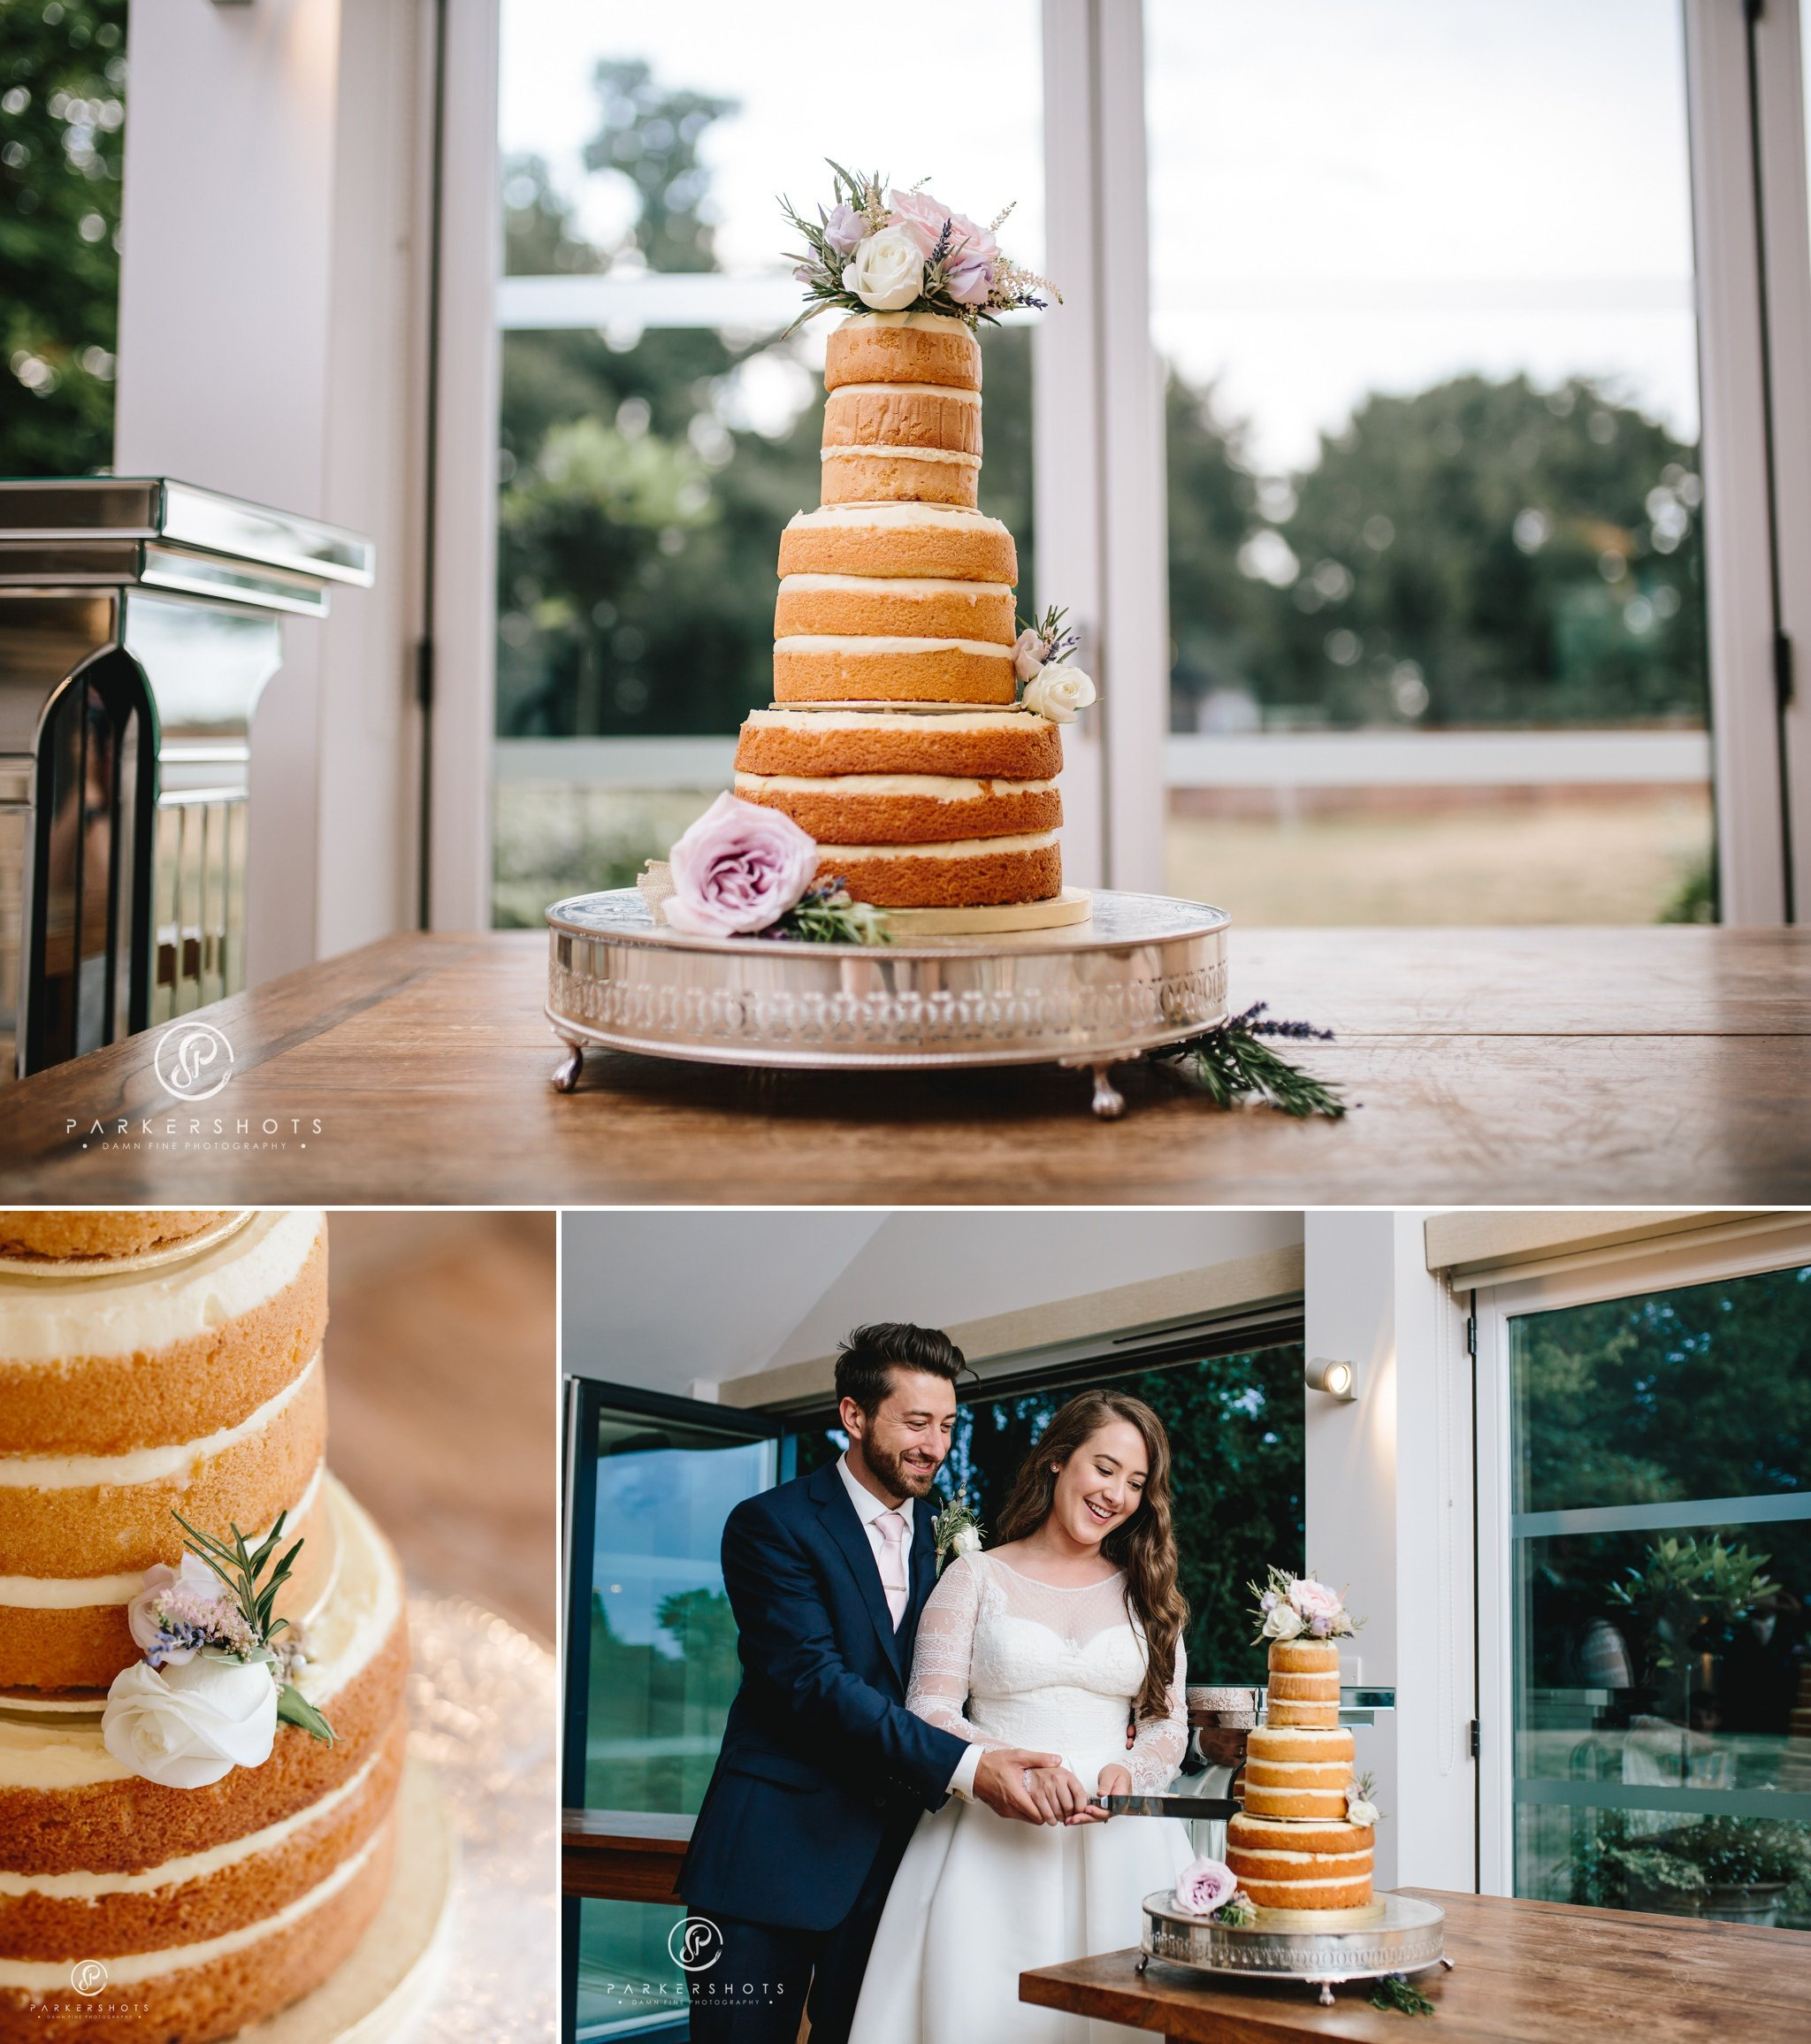 wedding cake by Wasing Park Wedding Photographer